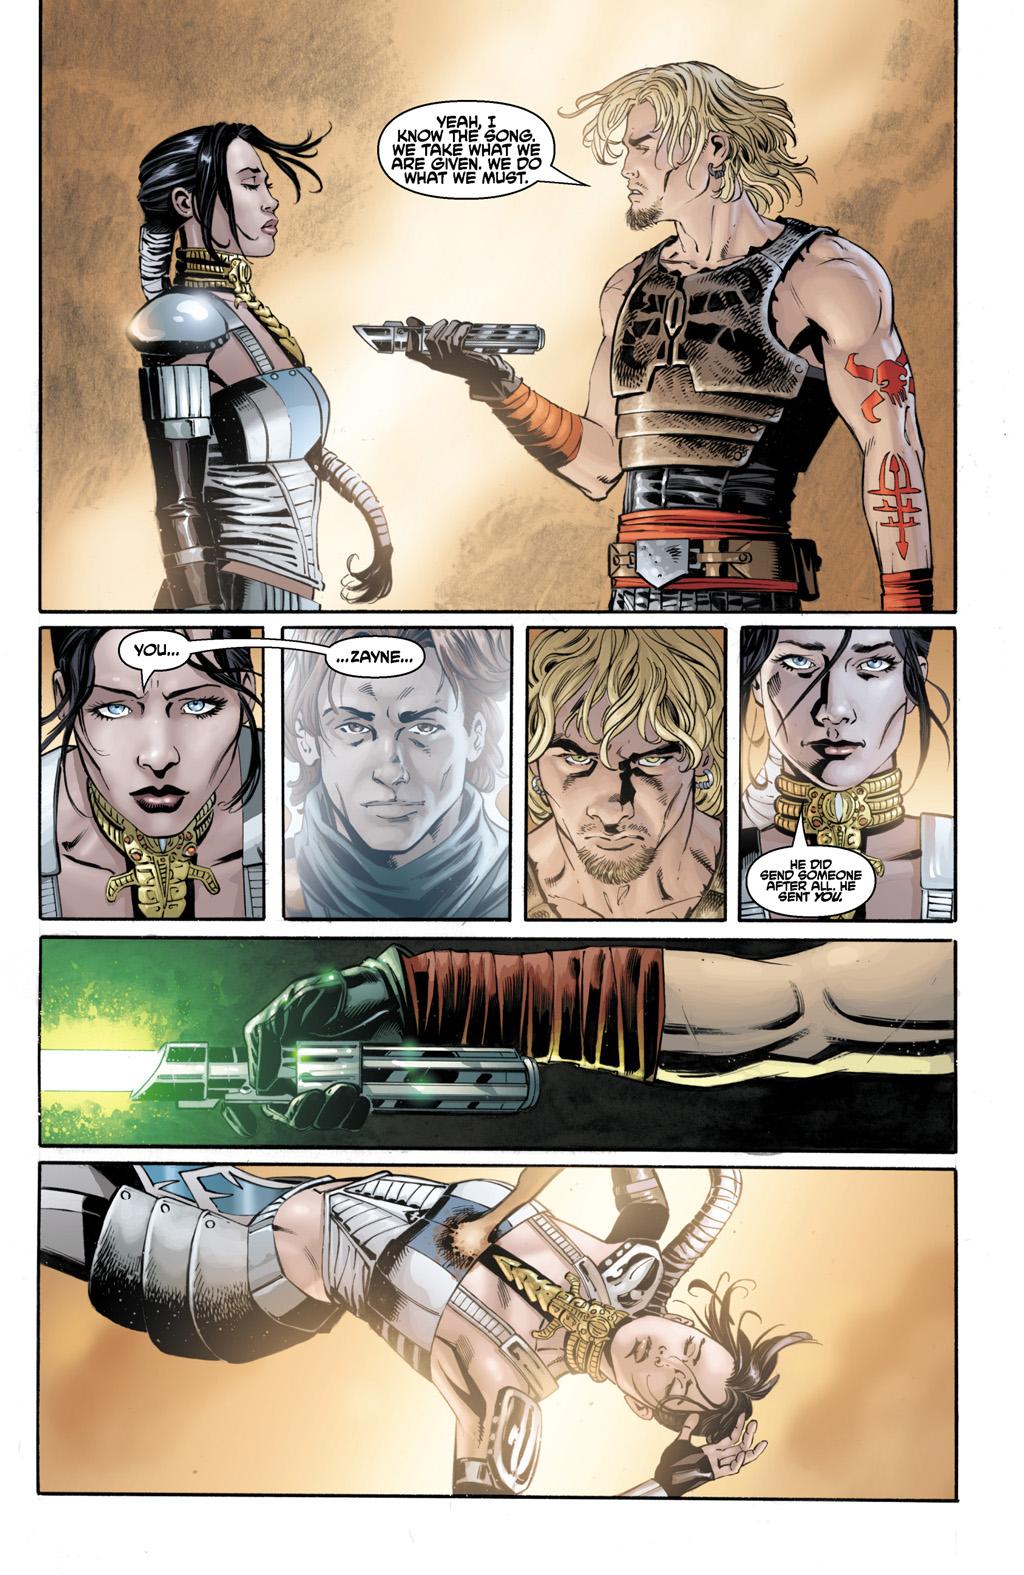 Cade Skywalker Kills Celeste Morne